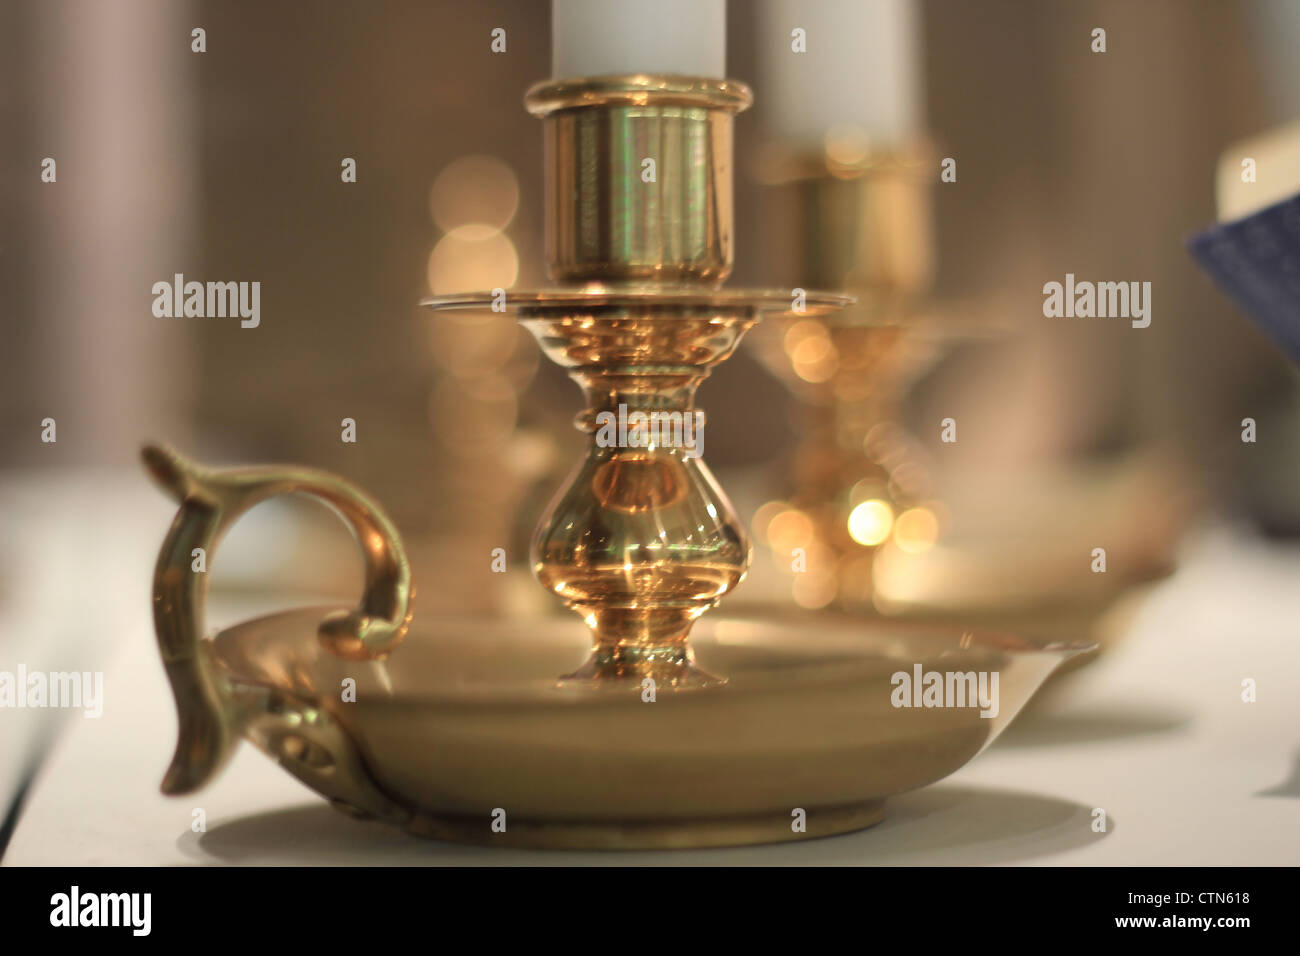 Golden candlestick. - Stock Image